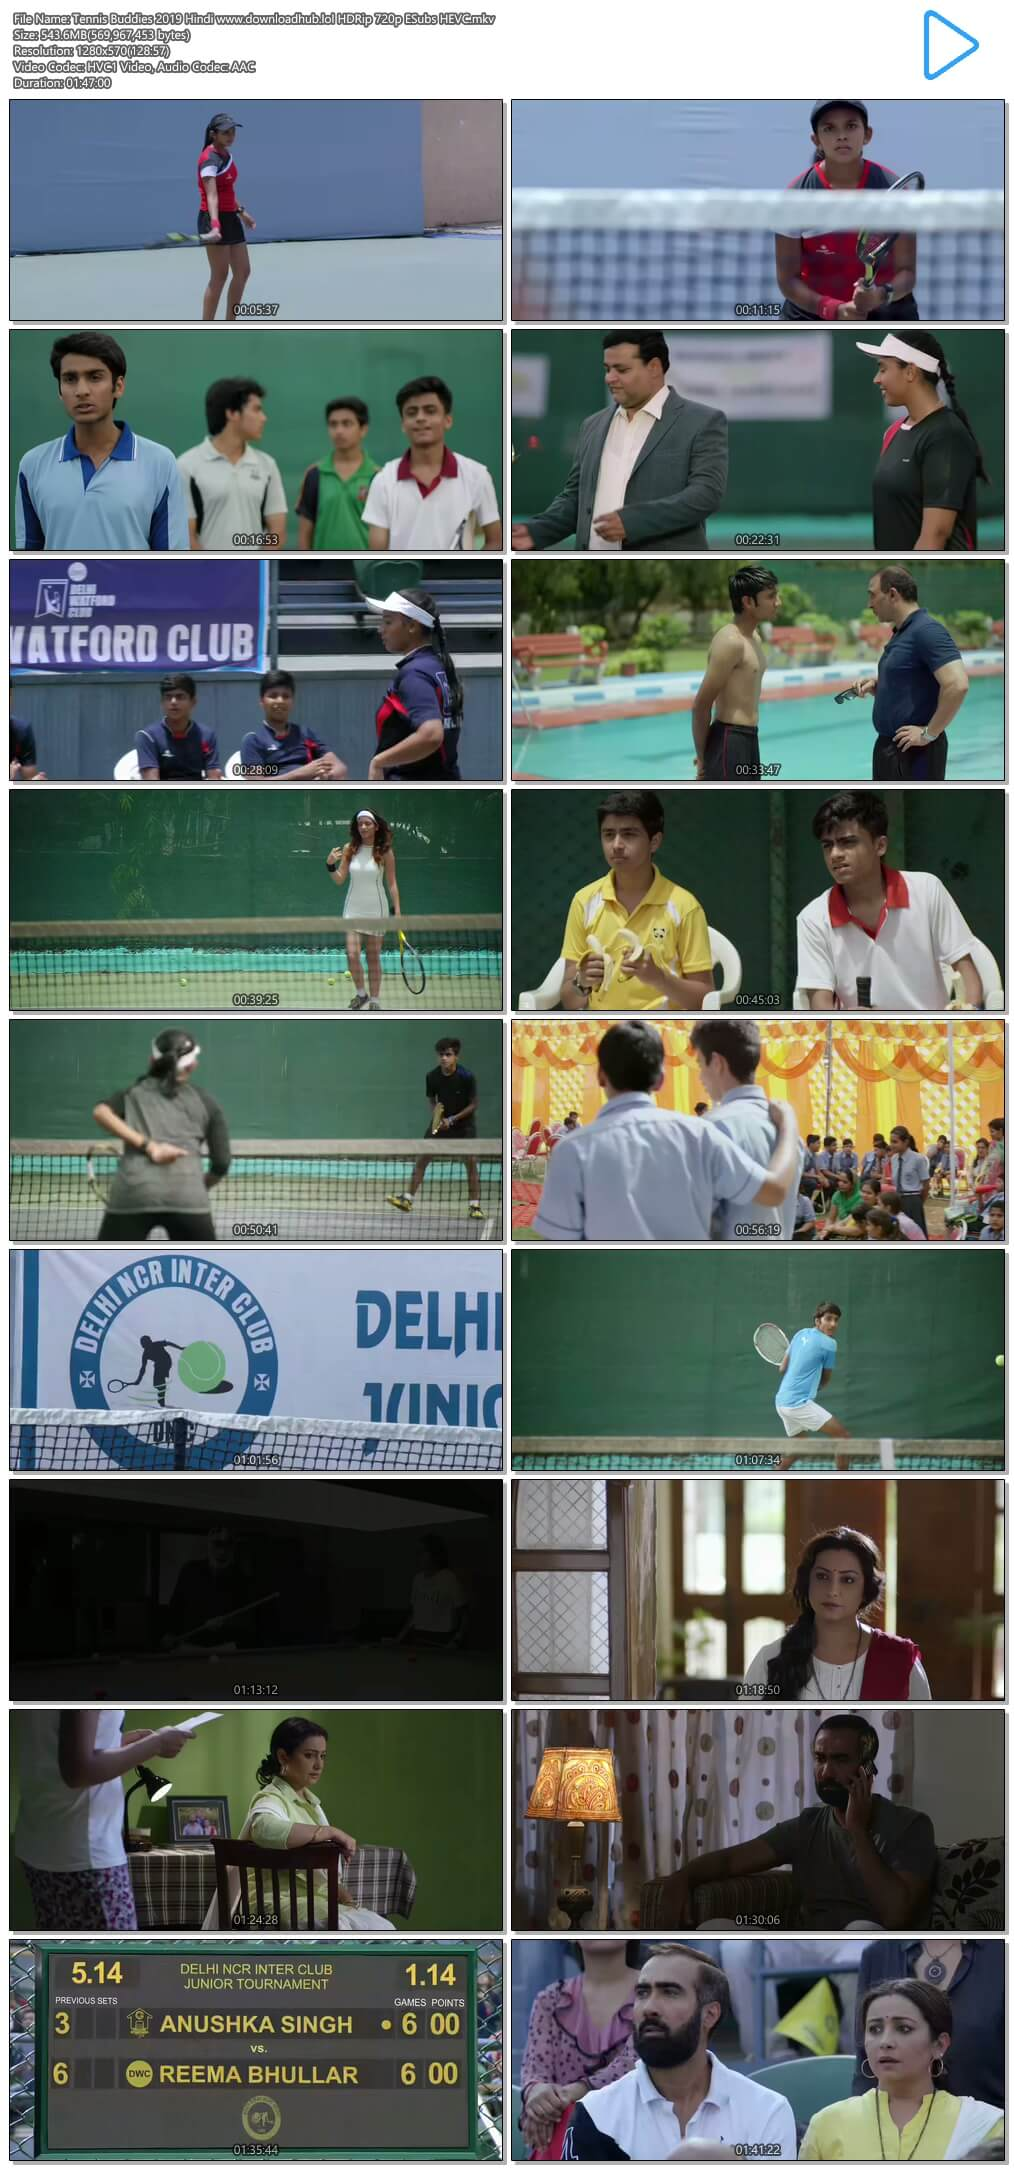 Tennis Buddies 2019 Hindi 500MB HDRip 720p ESubs HEVC